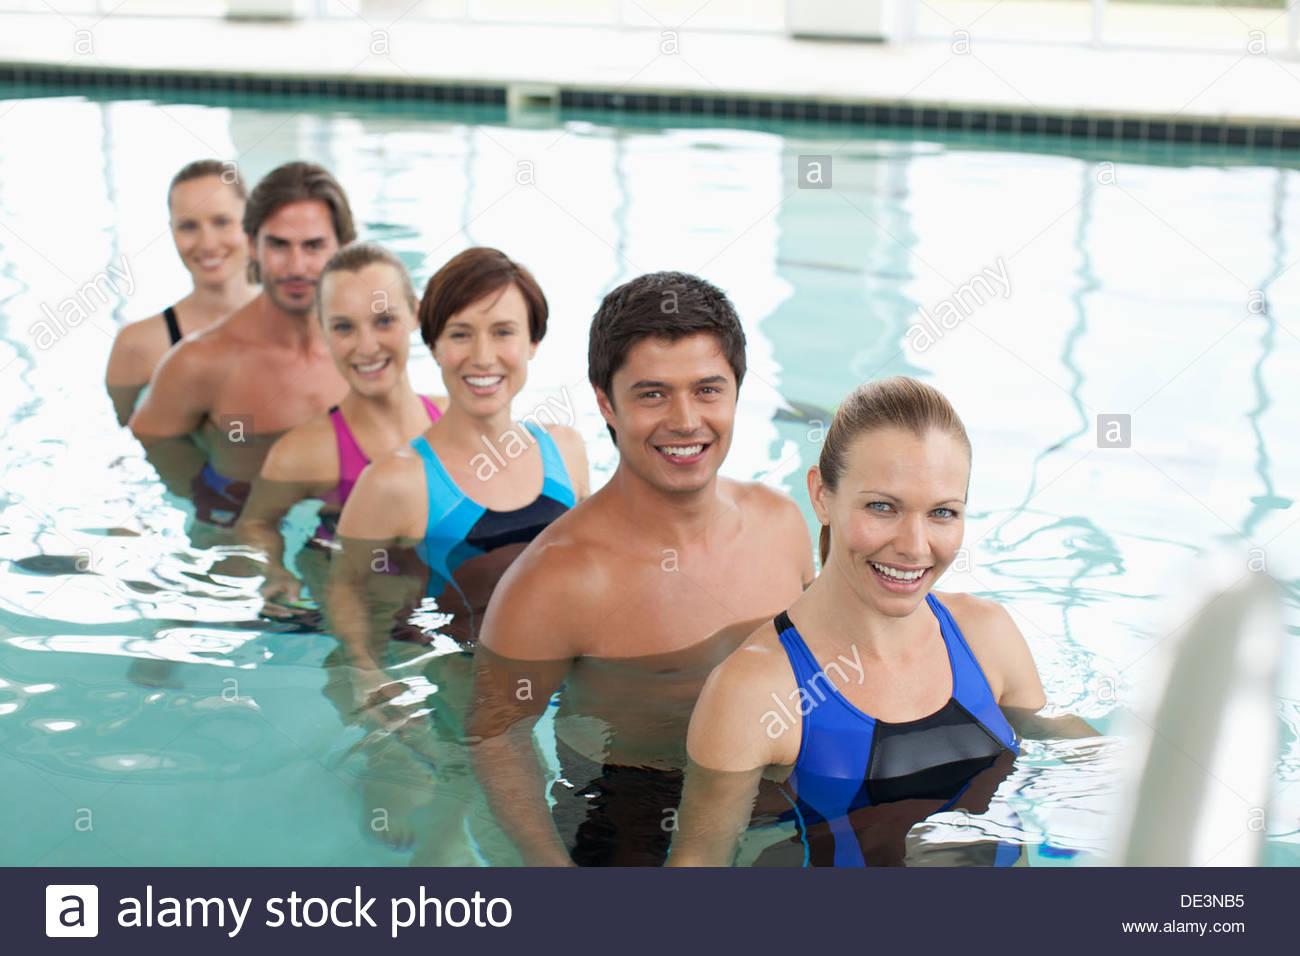 Six personnes en piscine Photo Stock